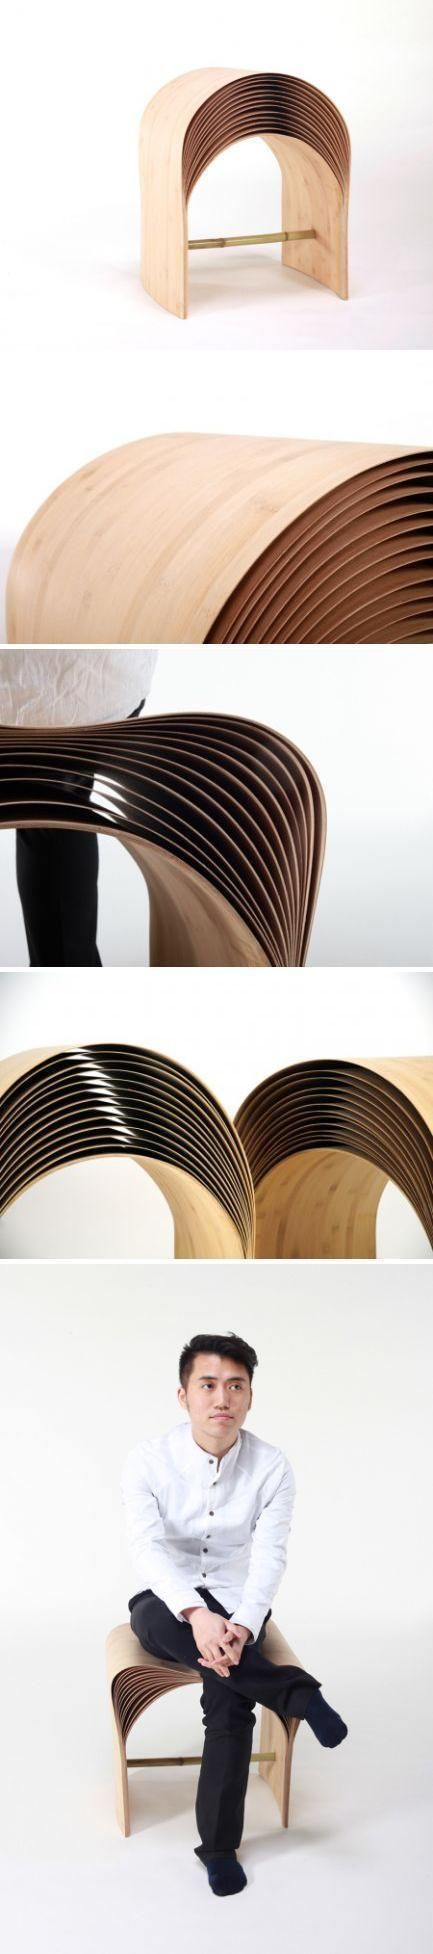 Hangzhou Bent Bamboo Stool By Min Chen Gcse Resistant